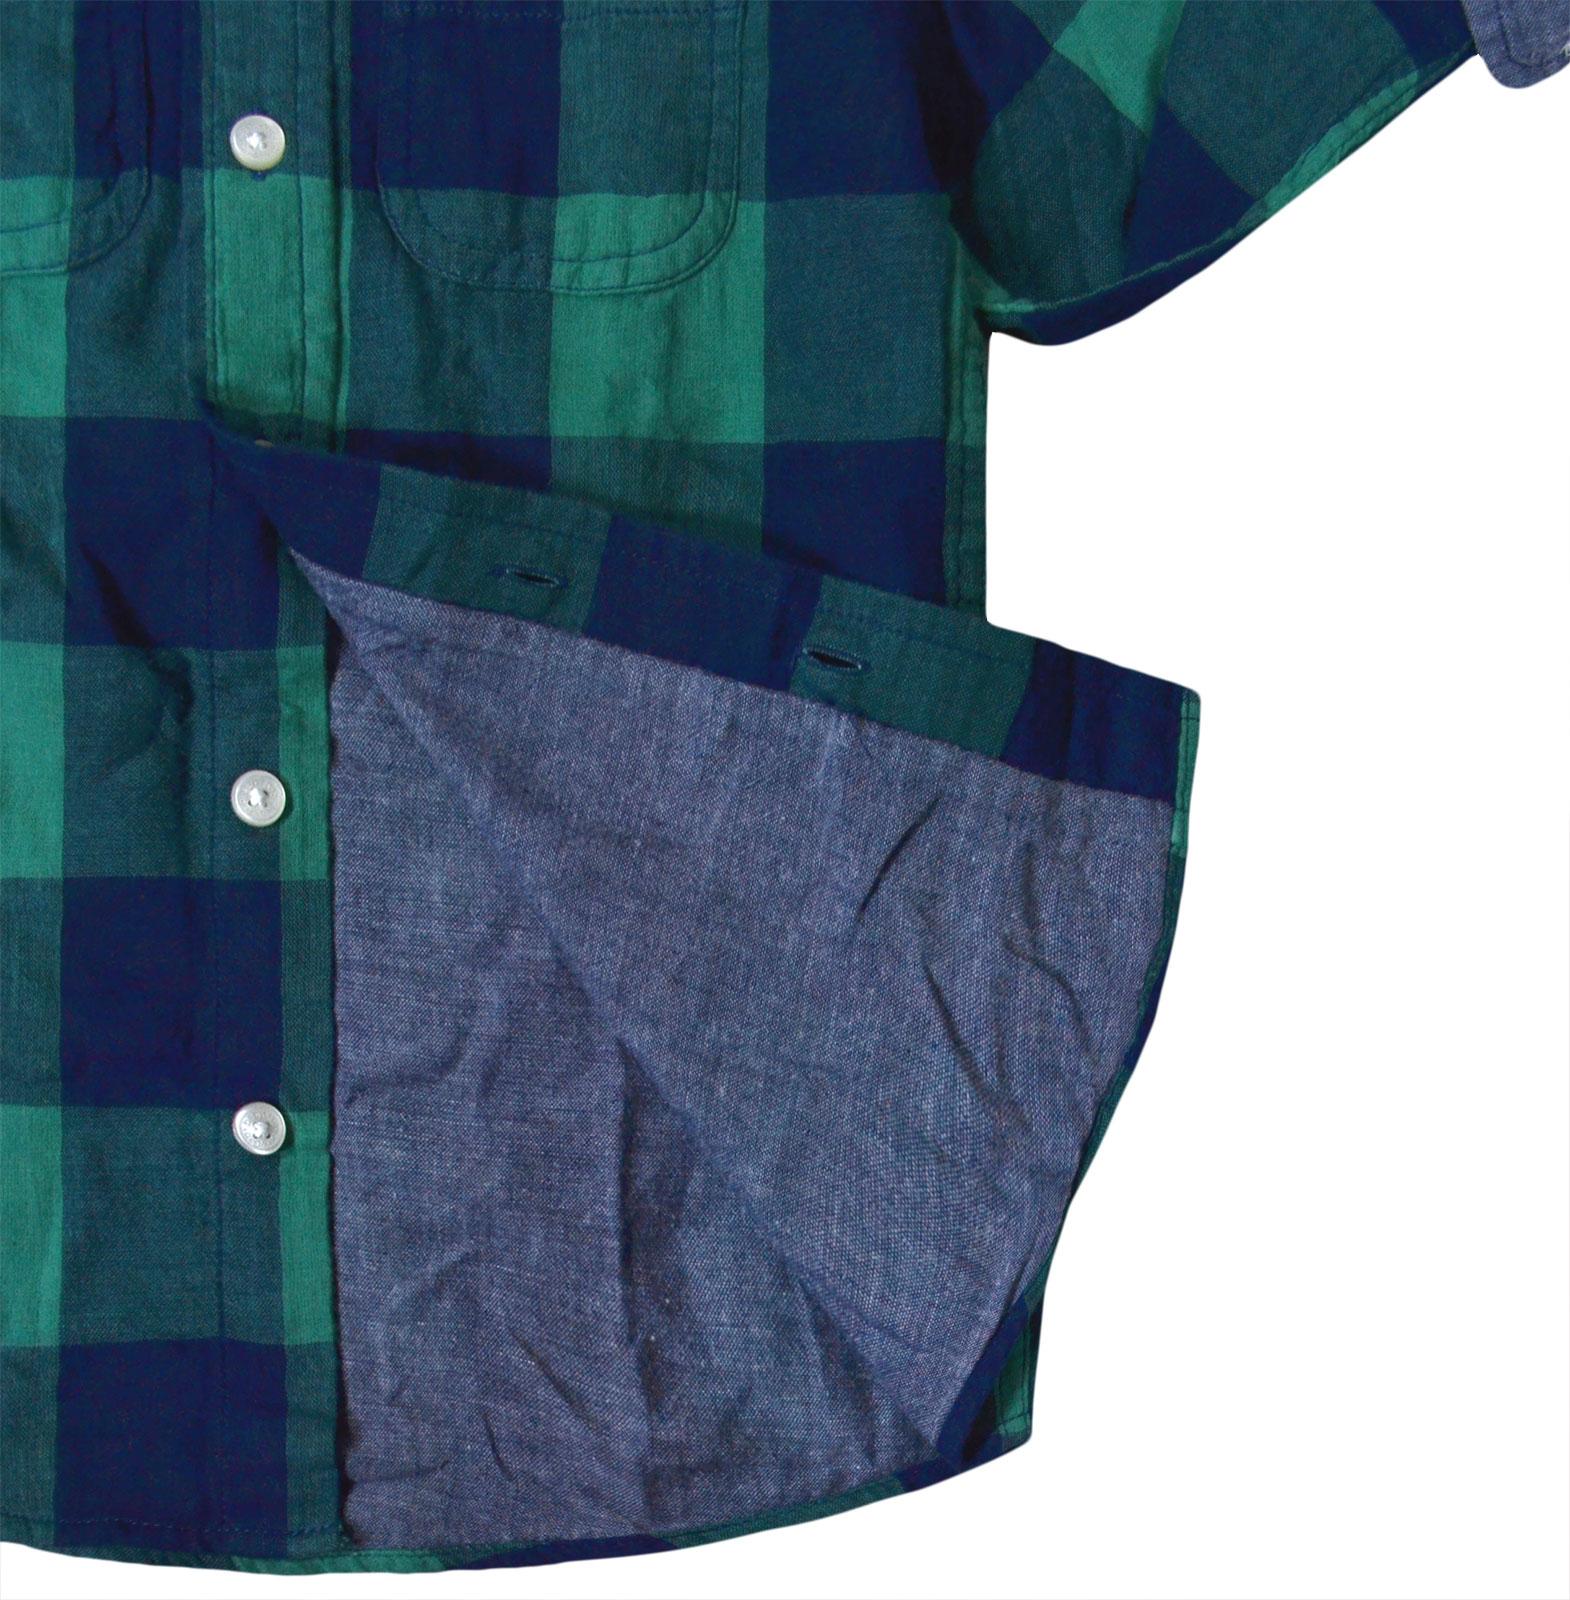 Boys-Ex-GAP-Shirt-Boy-Long-Sleeve-Cotton-Top-Green-Check-Ages-2-3-4-5-6-Years miniatura 3